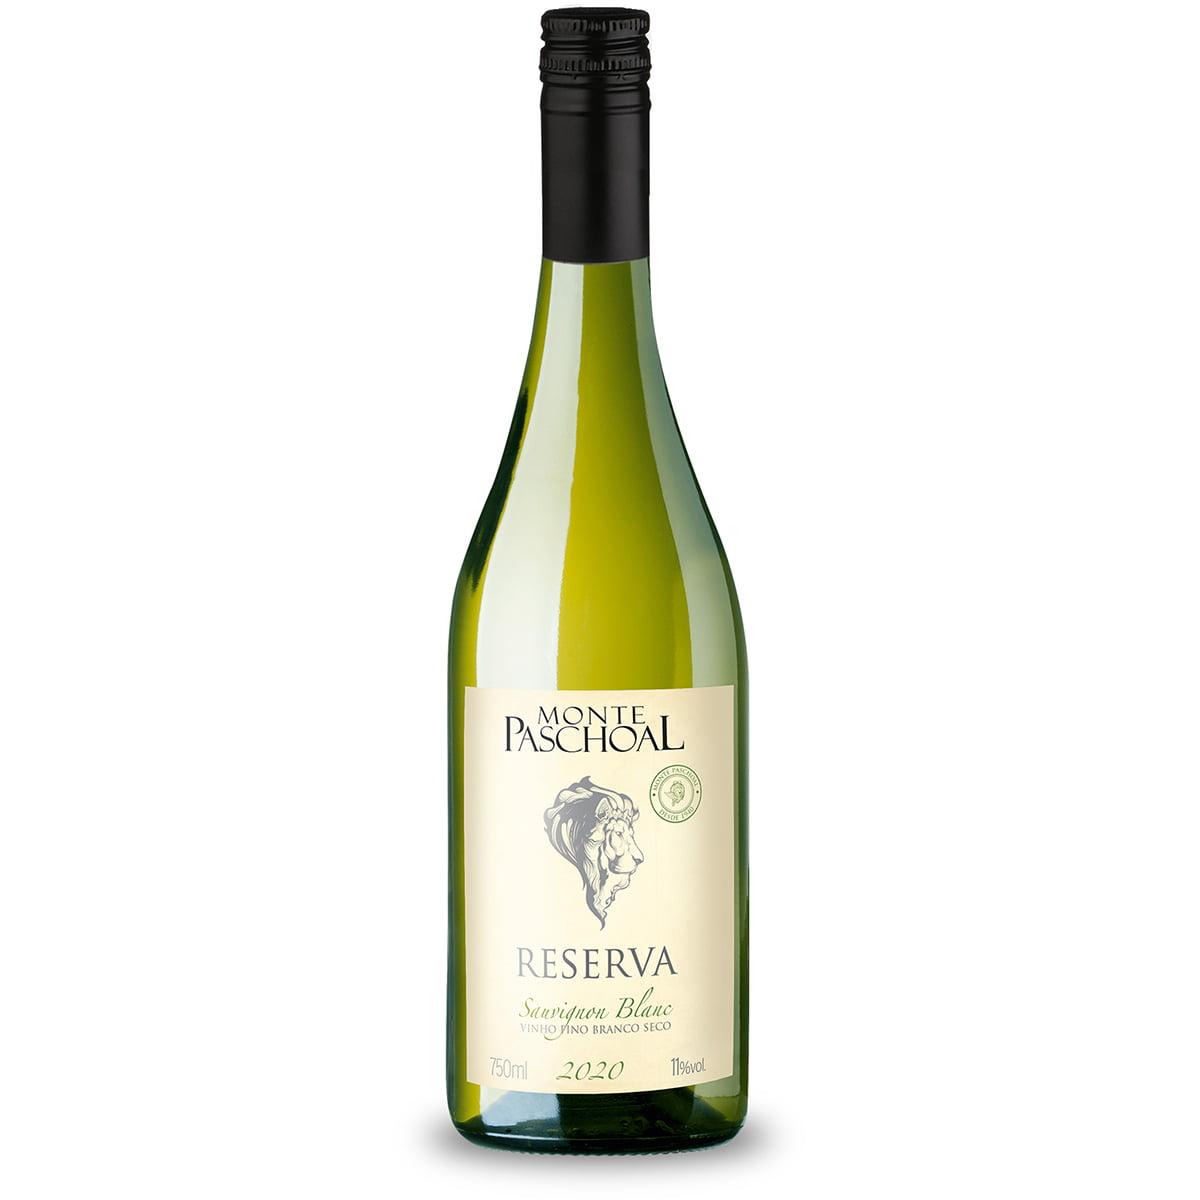 Vinho Monte Paschoal Reserva Sauvignon Blanc Branco Seco 750ml